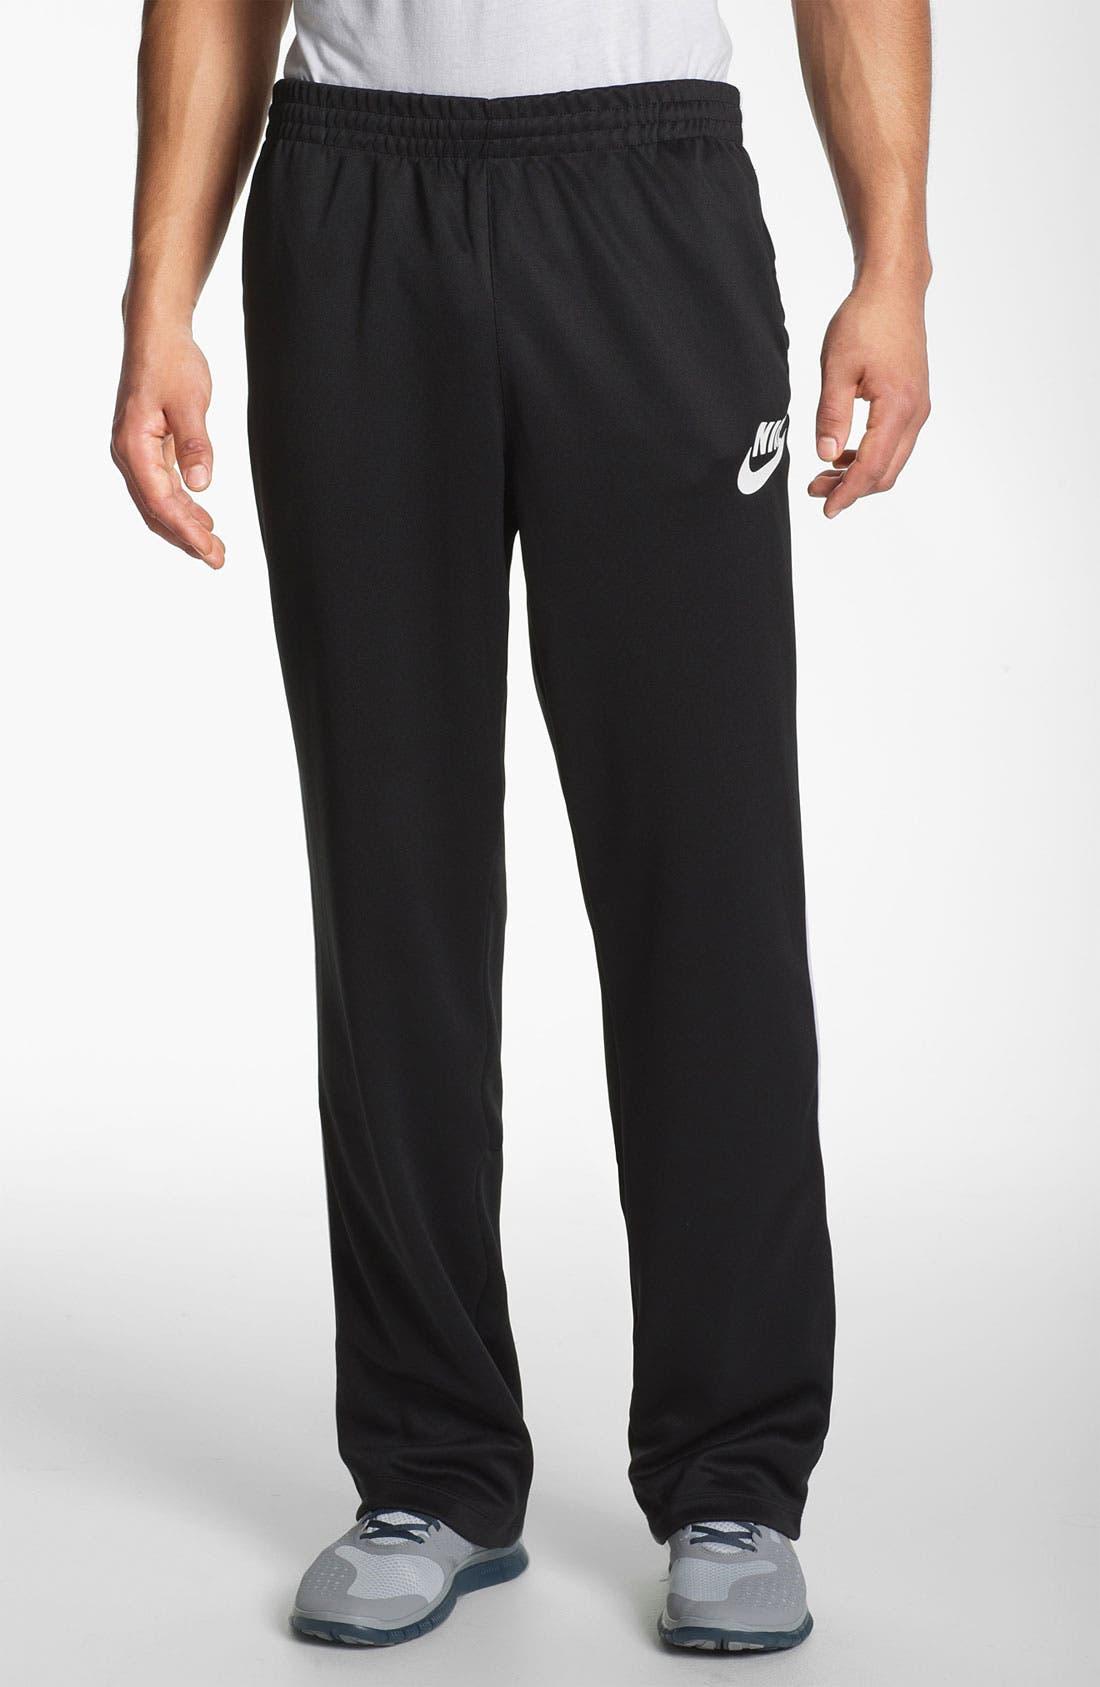 Alternate Image 1 Selected - Nike 'HBR' Track Pants